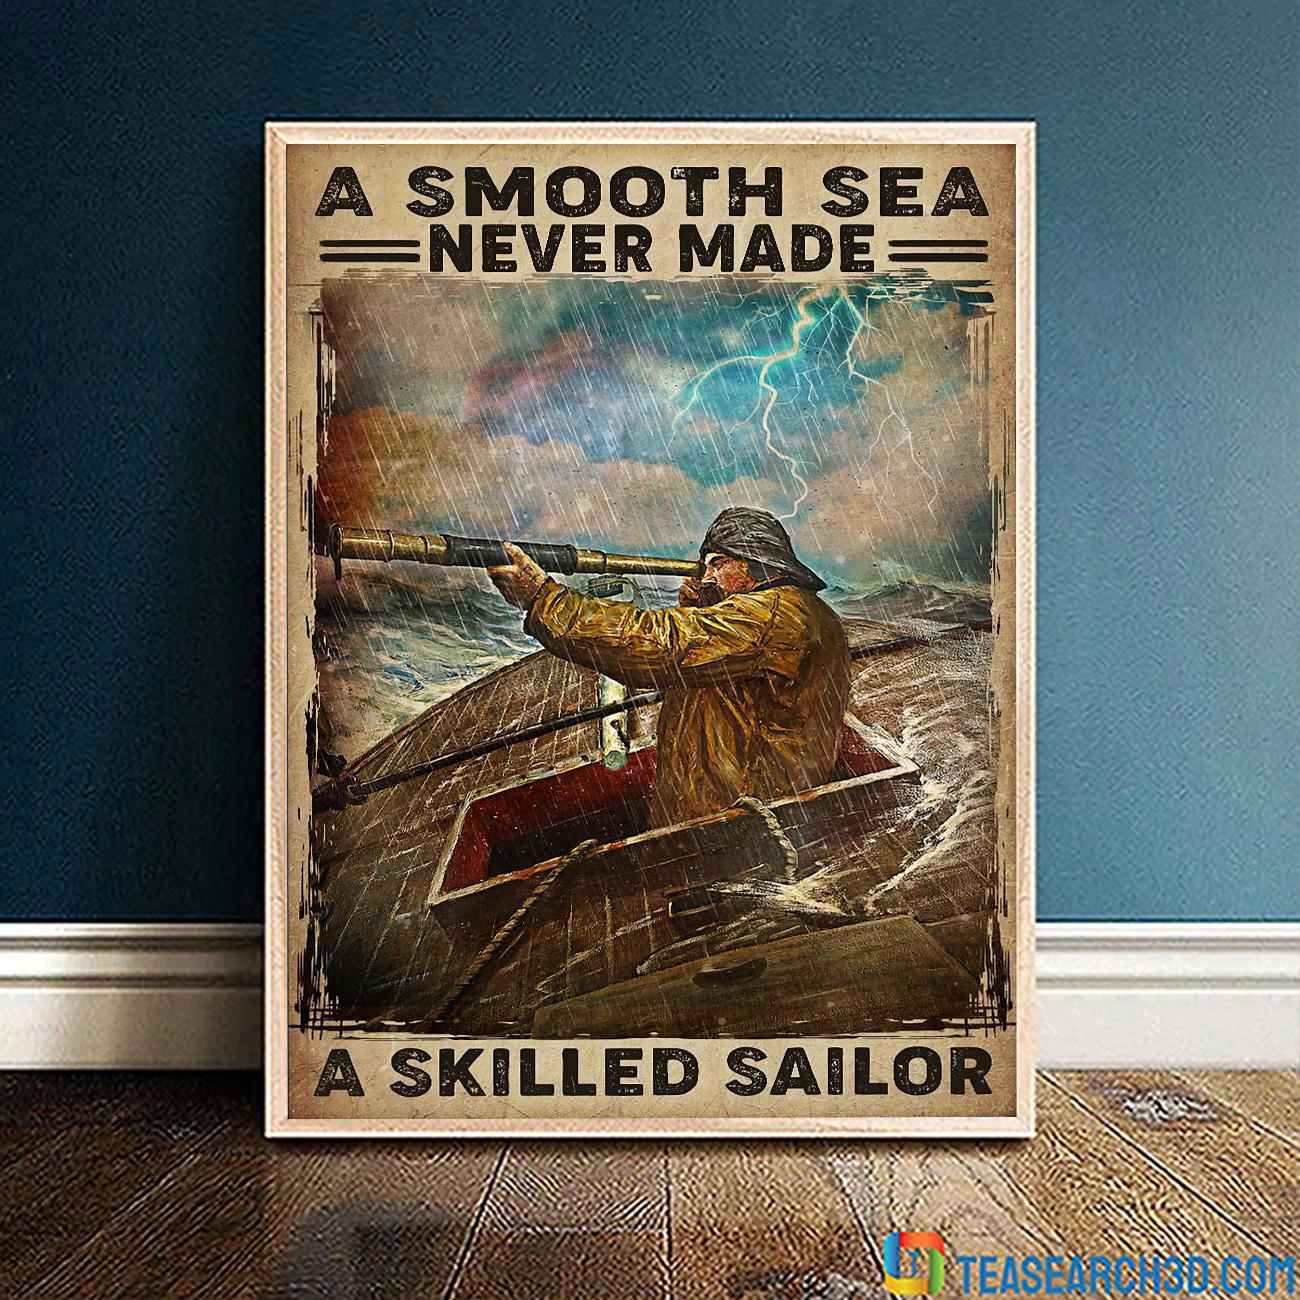 A smooth sea never made a skilled sailor posterA smooth sea never made a skilled sailor poster